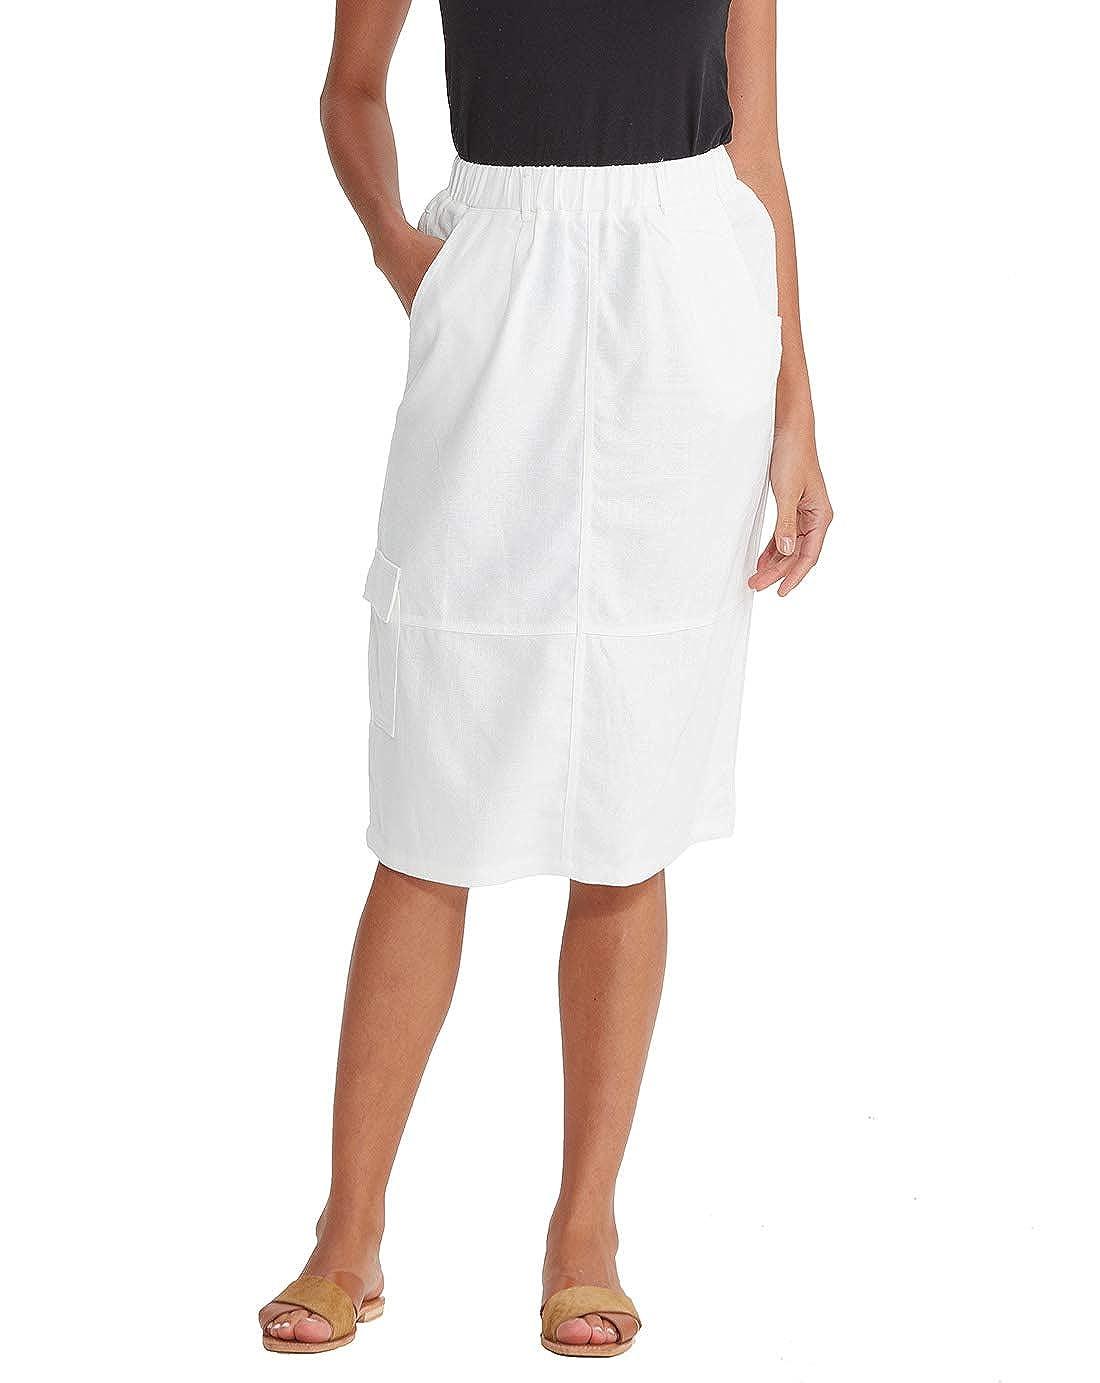 db369b1dd6 Womens Midi Skirts Knee Length with Pockets Summer Elastic Waist Cotton  Linen A Line Scrub Skirt at Amazon Women s Clothing store